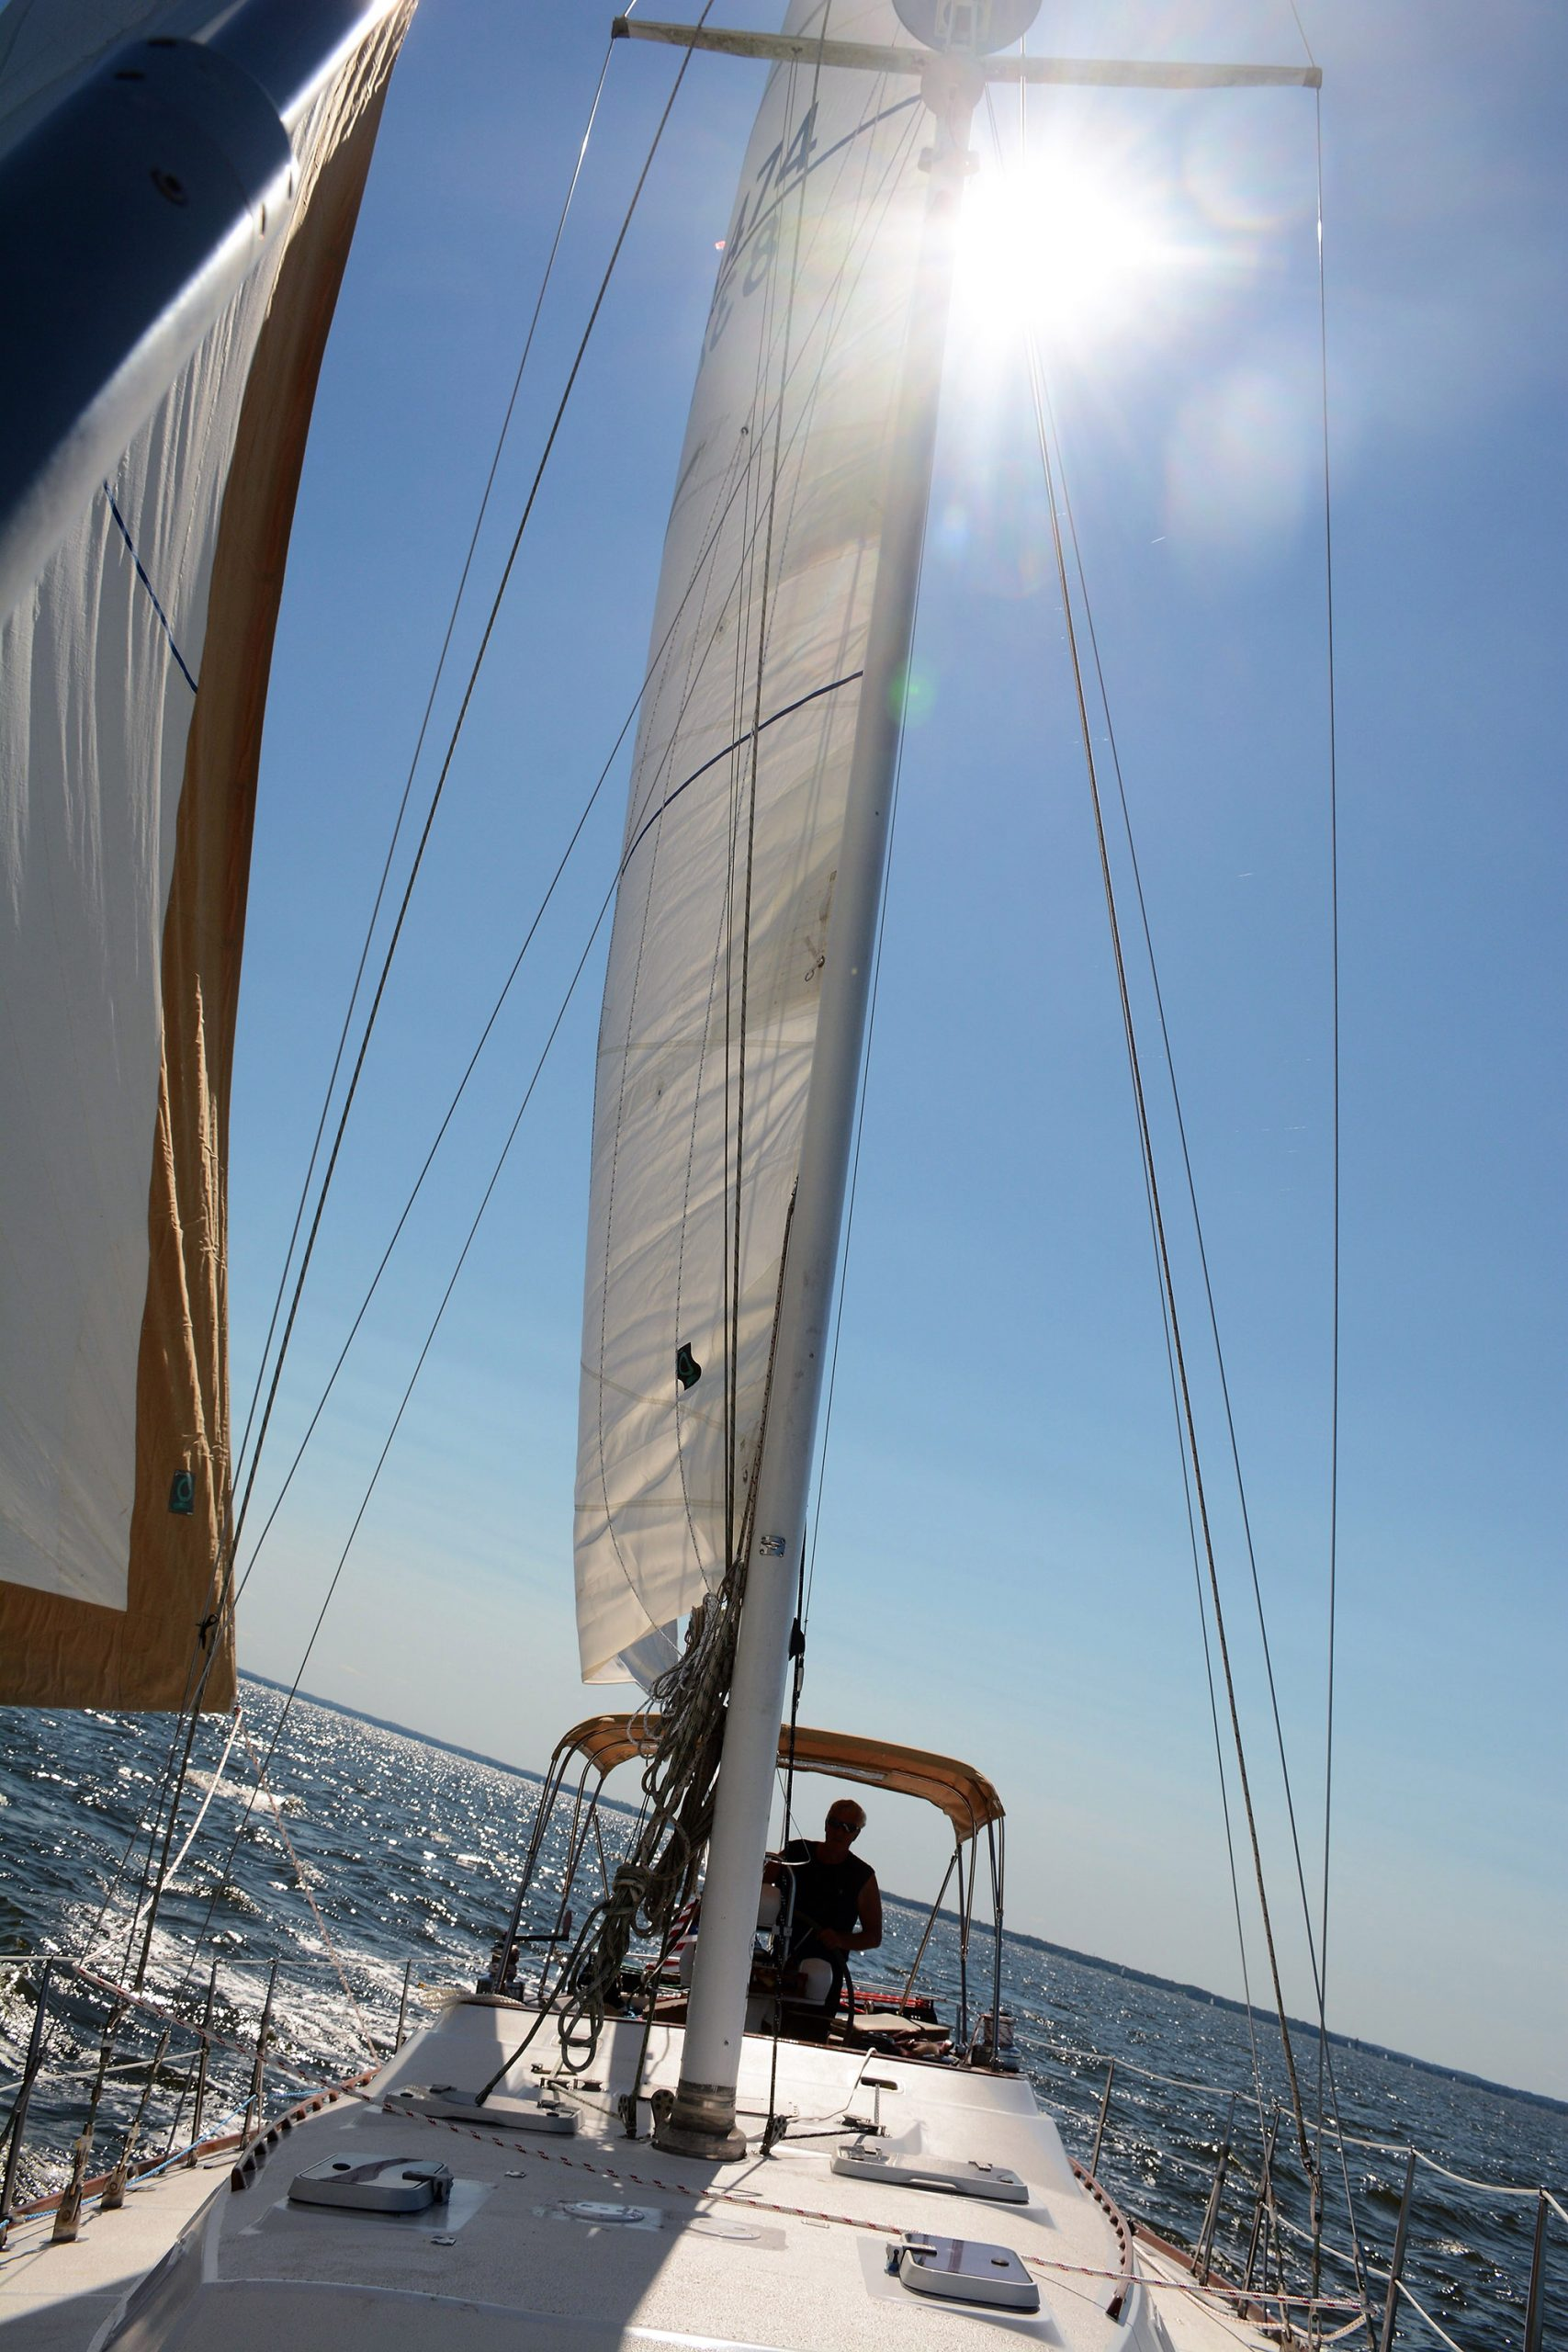 sailboat charter rental Chesapeake bay bareboat Annapolis md south river family birthday